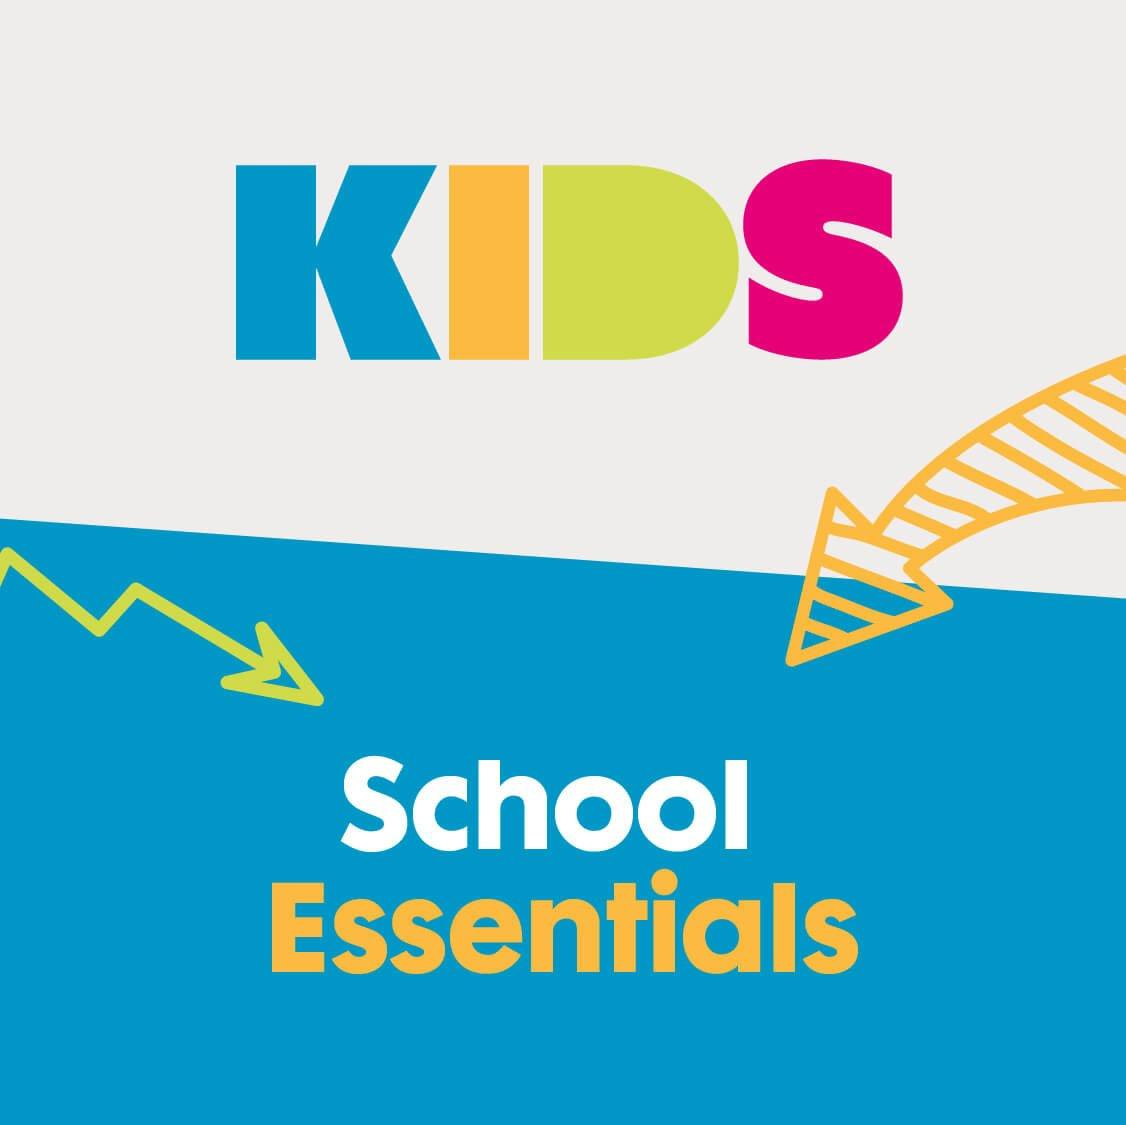 KIDS school essentials